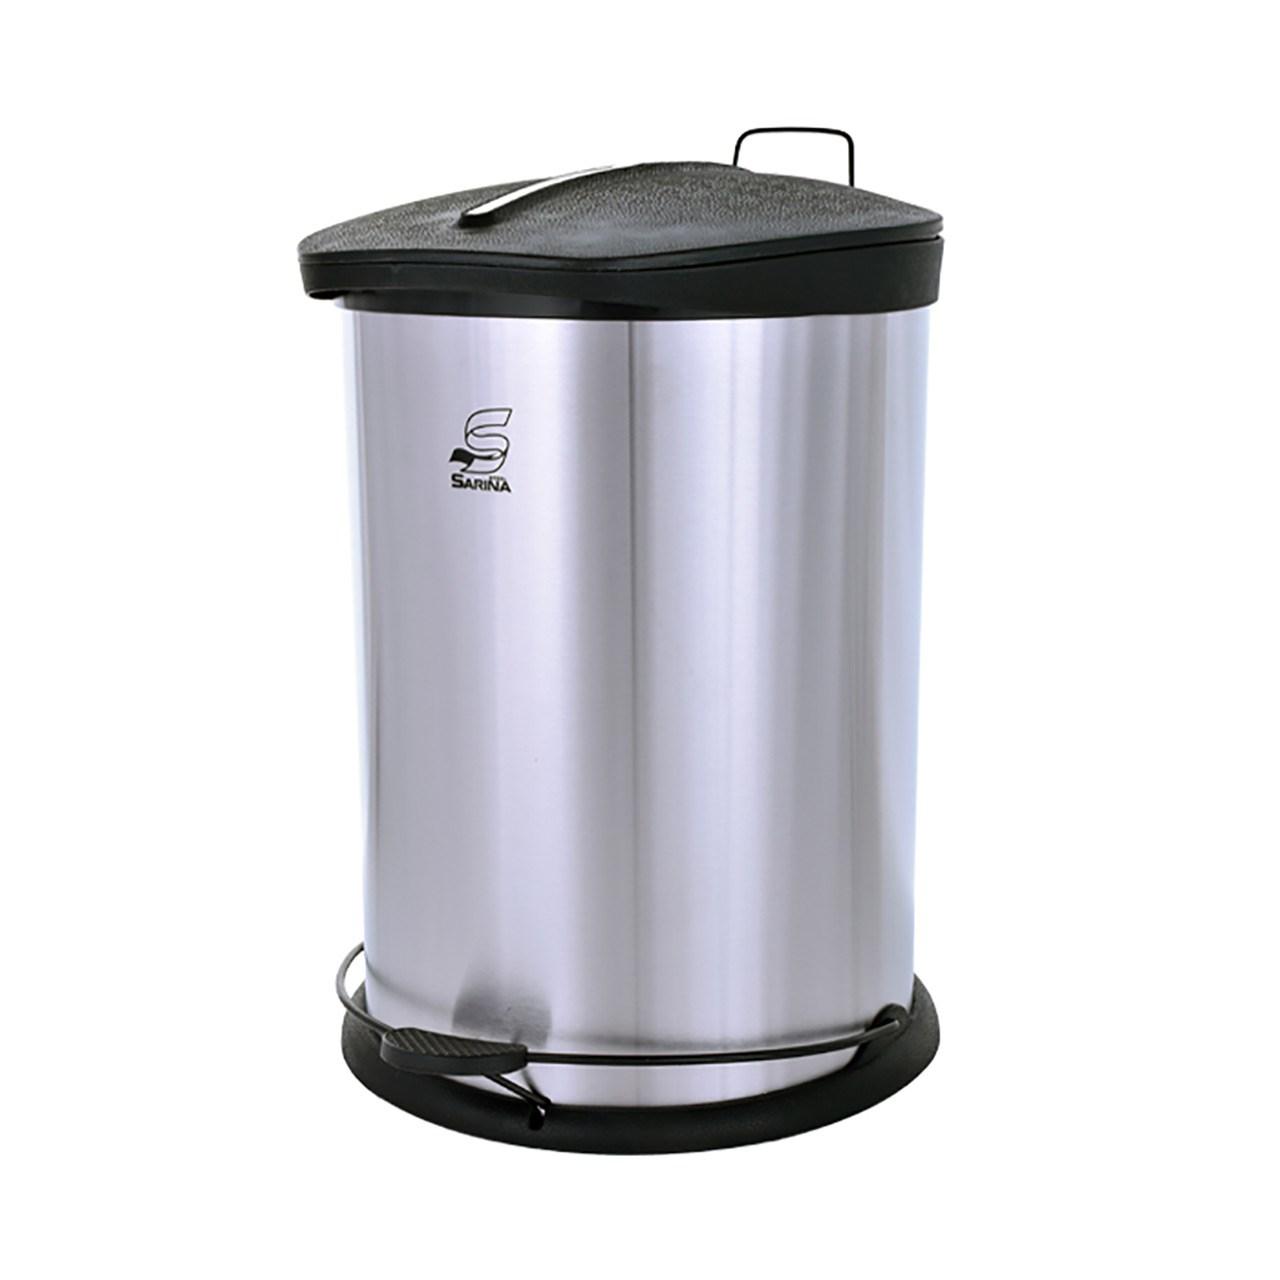 سطل زباله پدالی 20 لیتری سارینا کد 7550